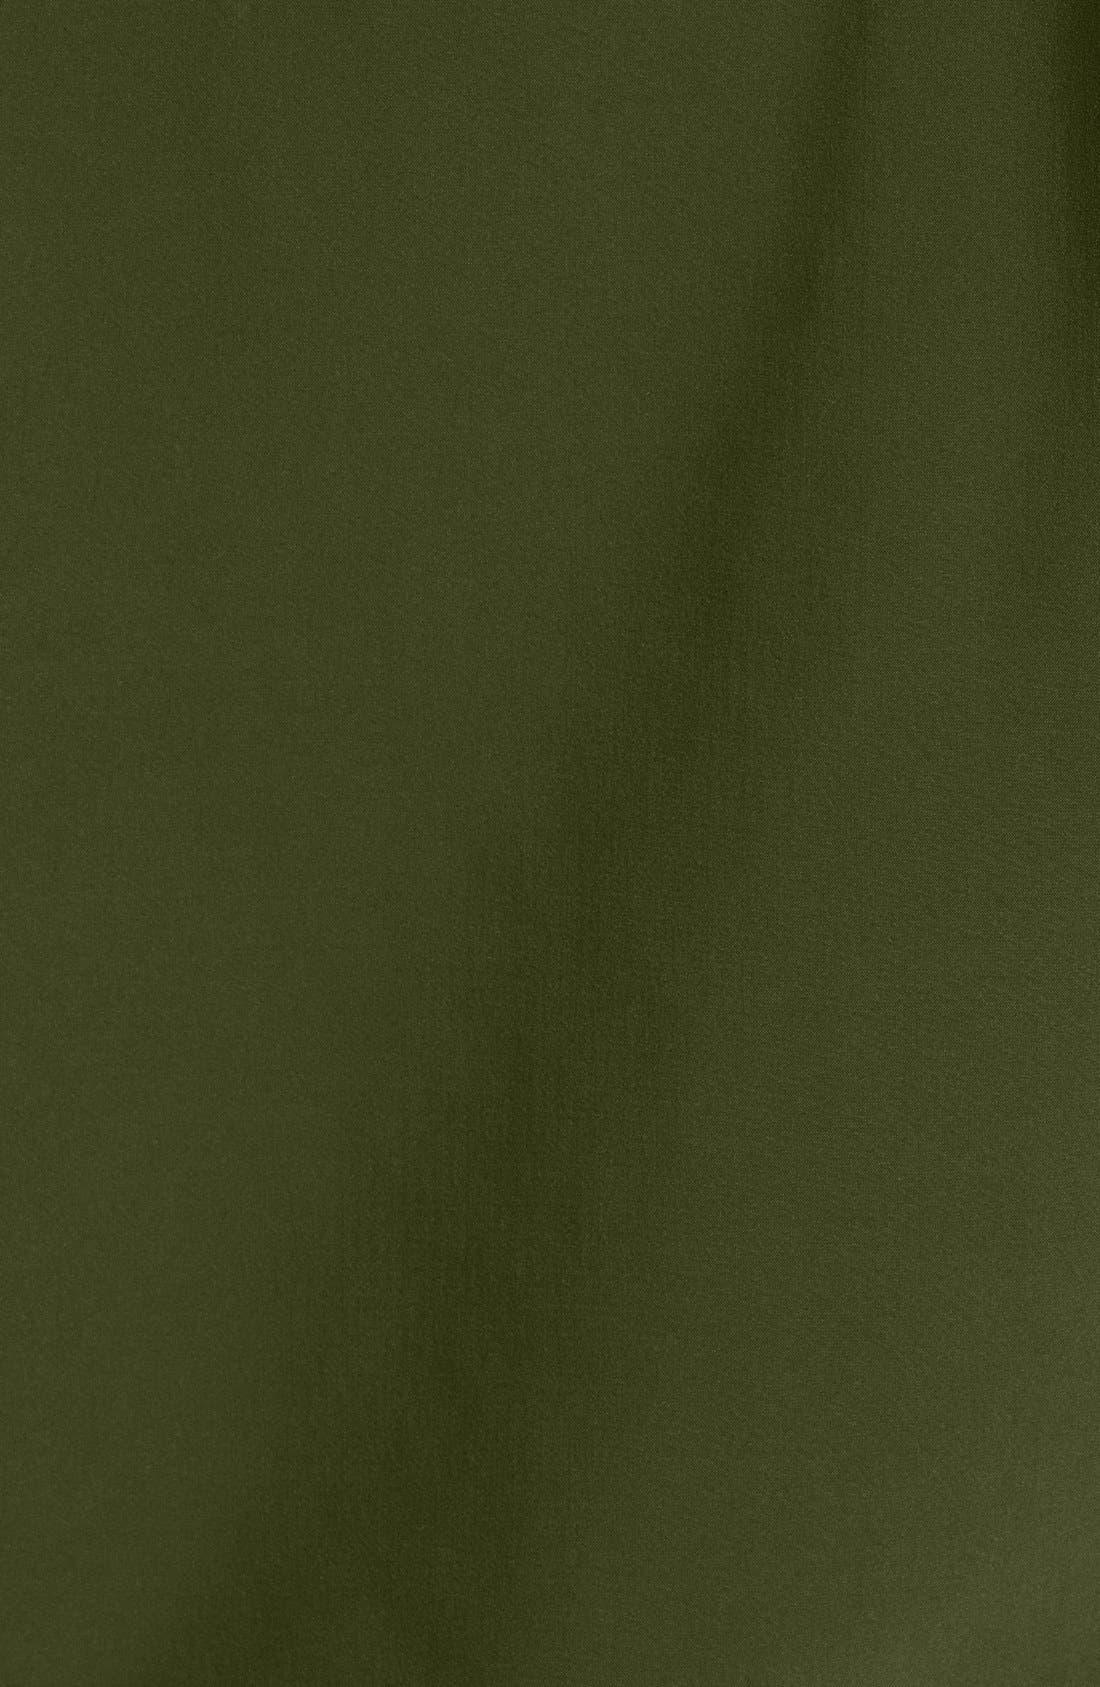 Alternate Image 3  - Canada Goose 'Moraine' Jacket